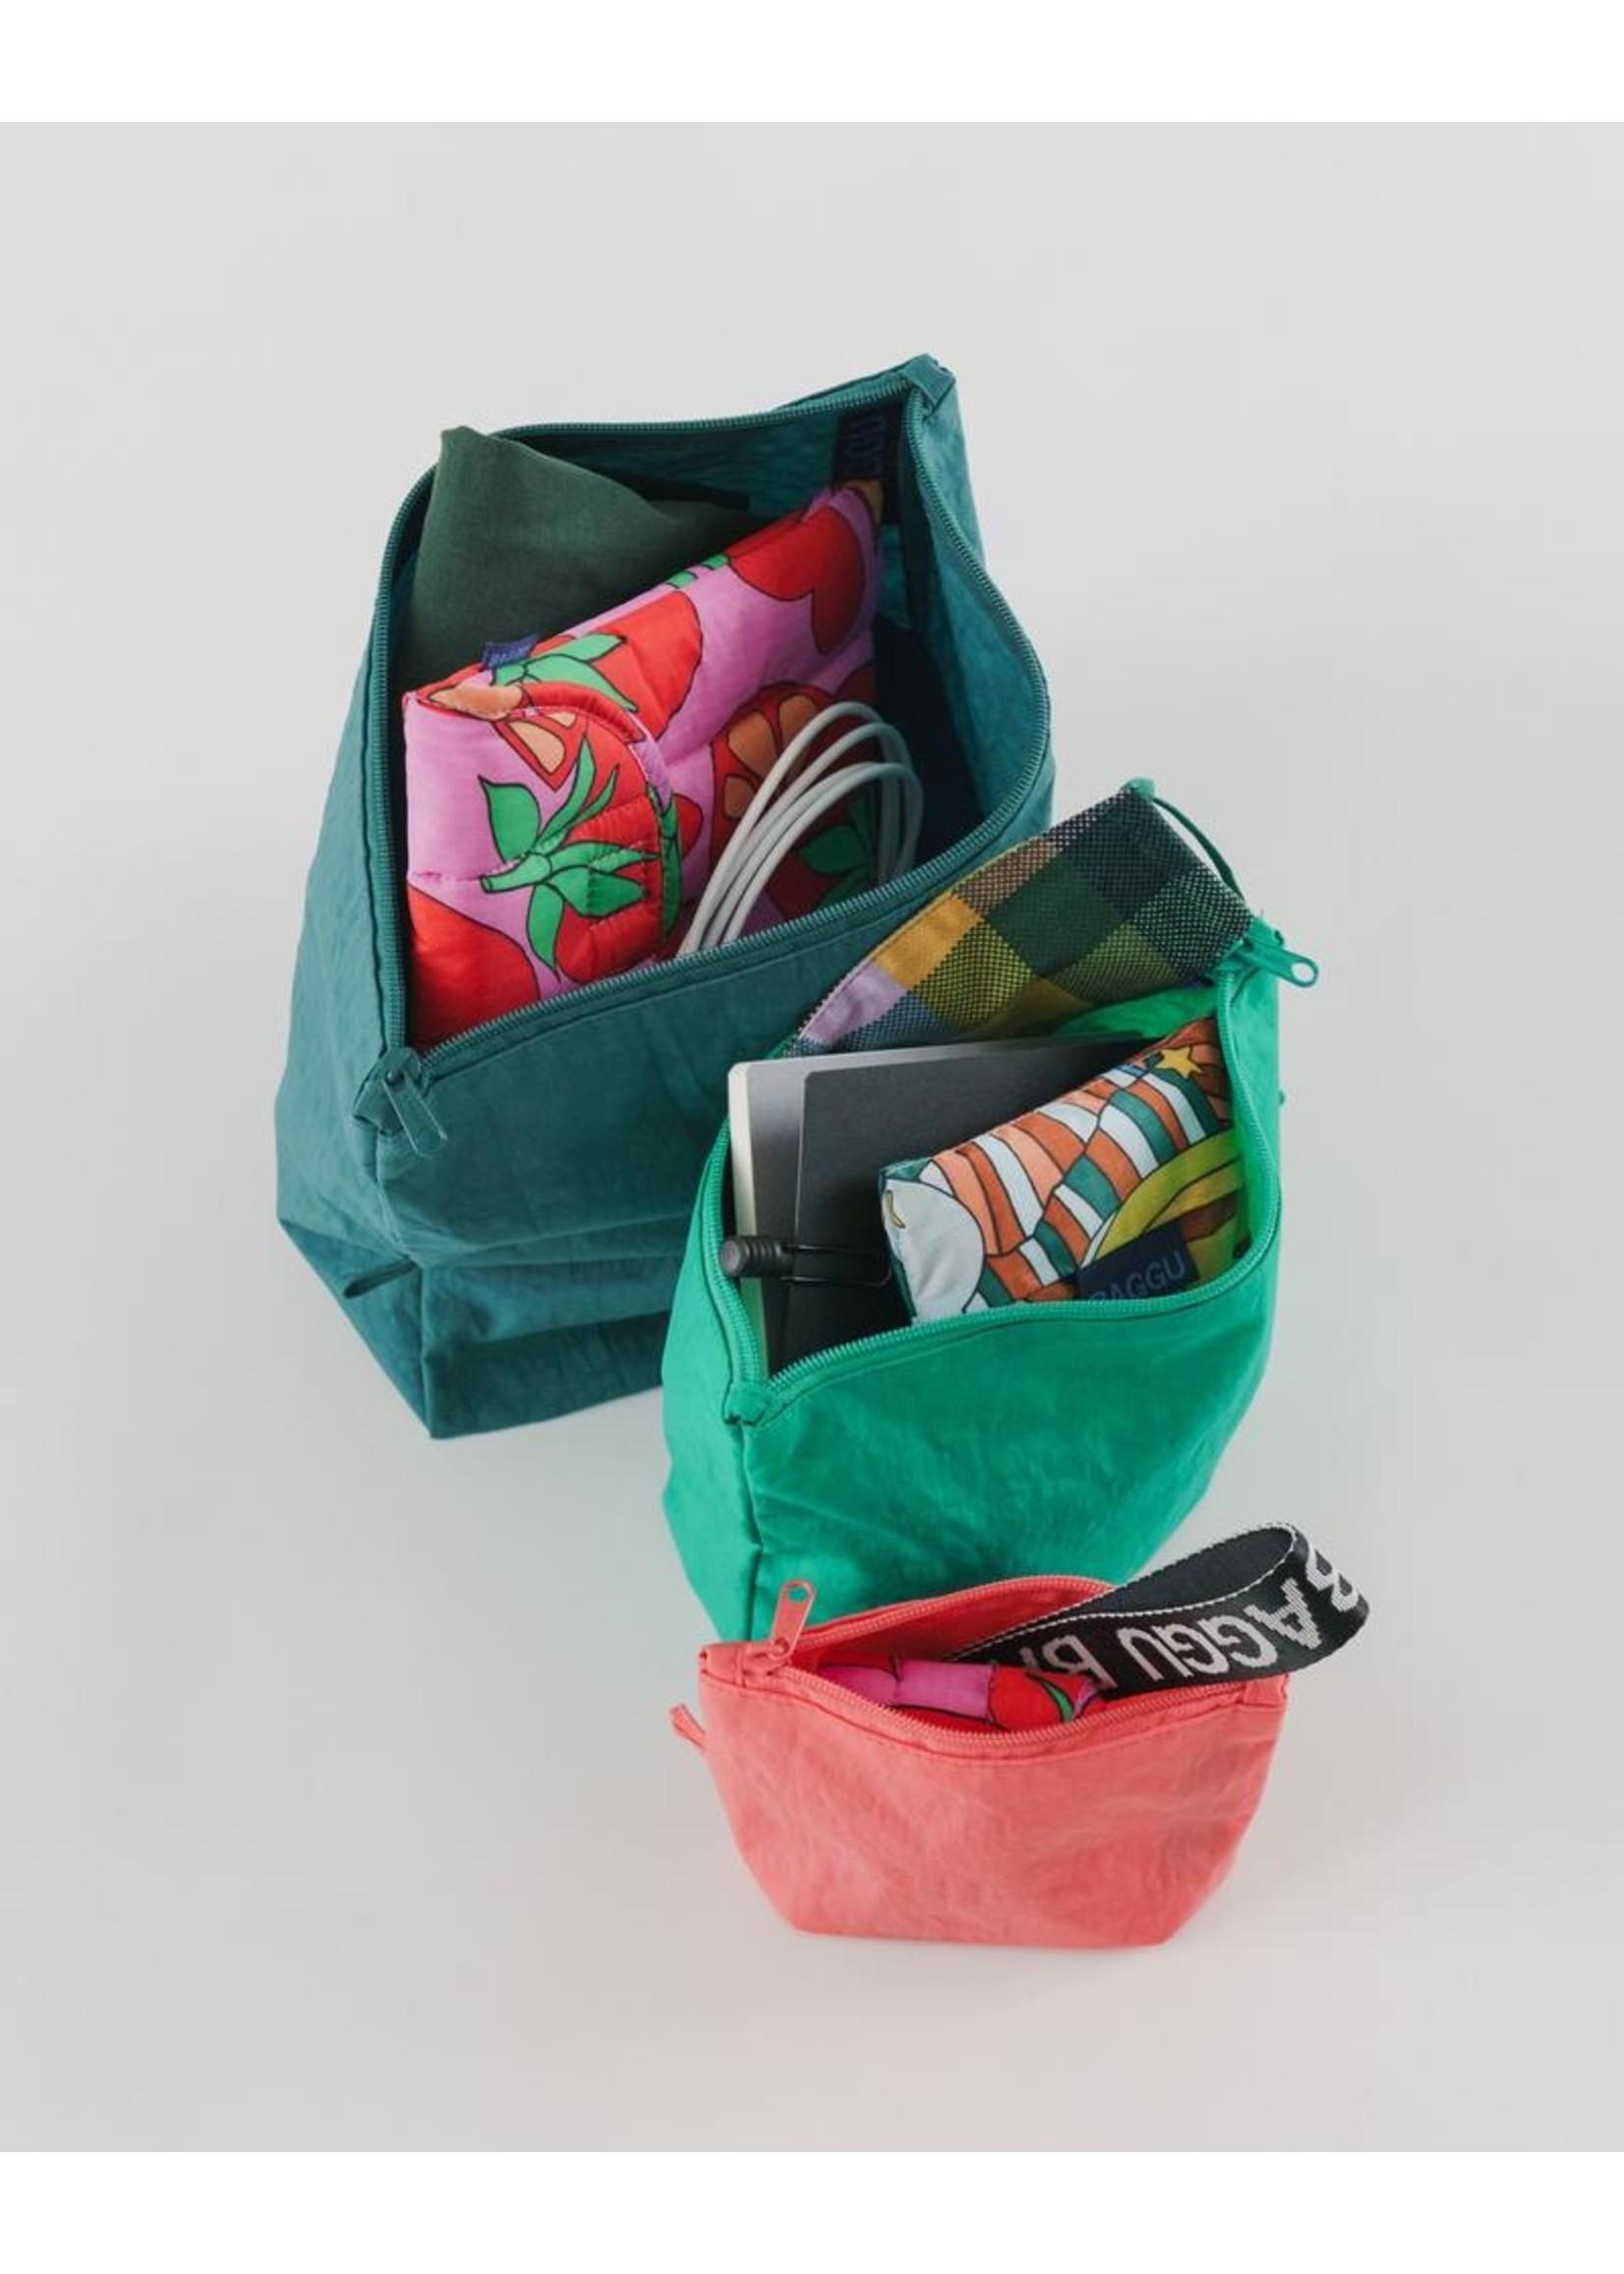 Baggu Baggu Go Pouch Set - Watermelon Slice